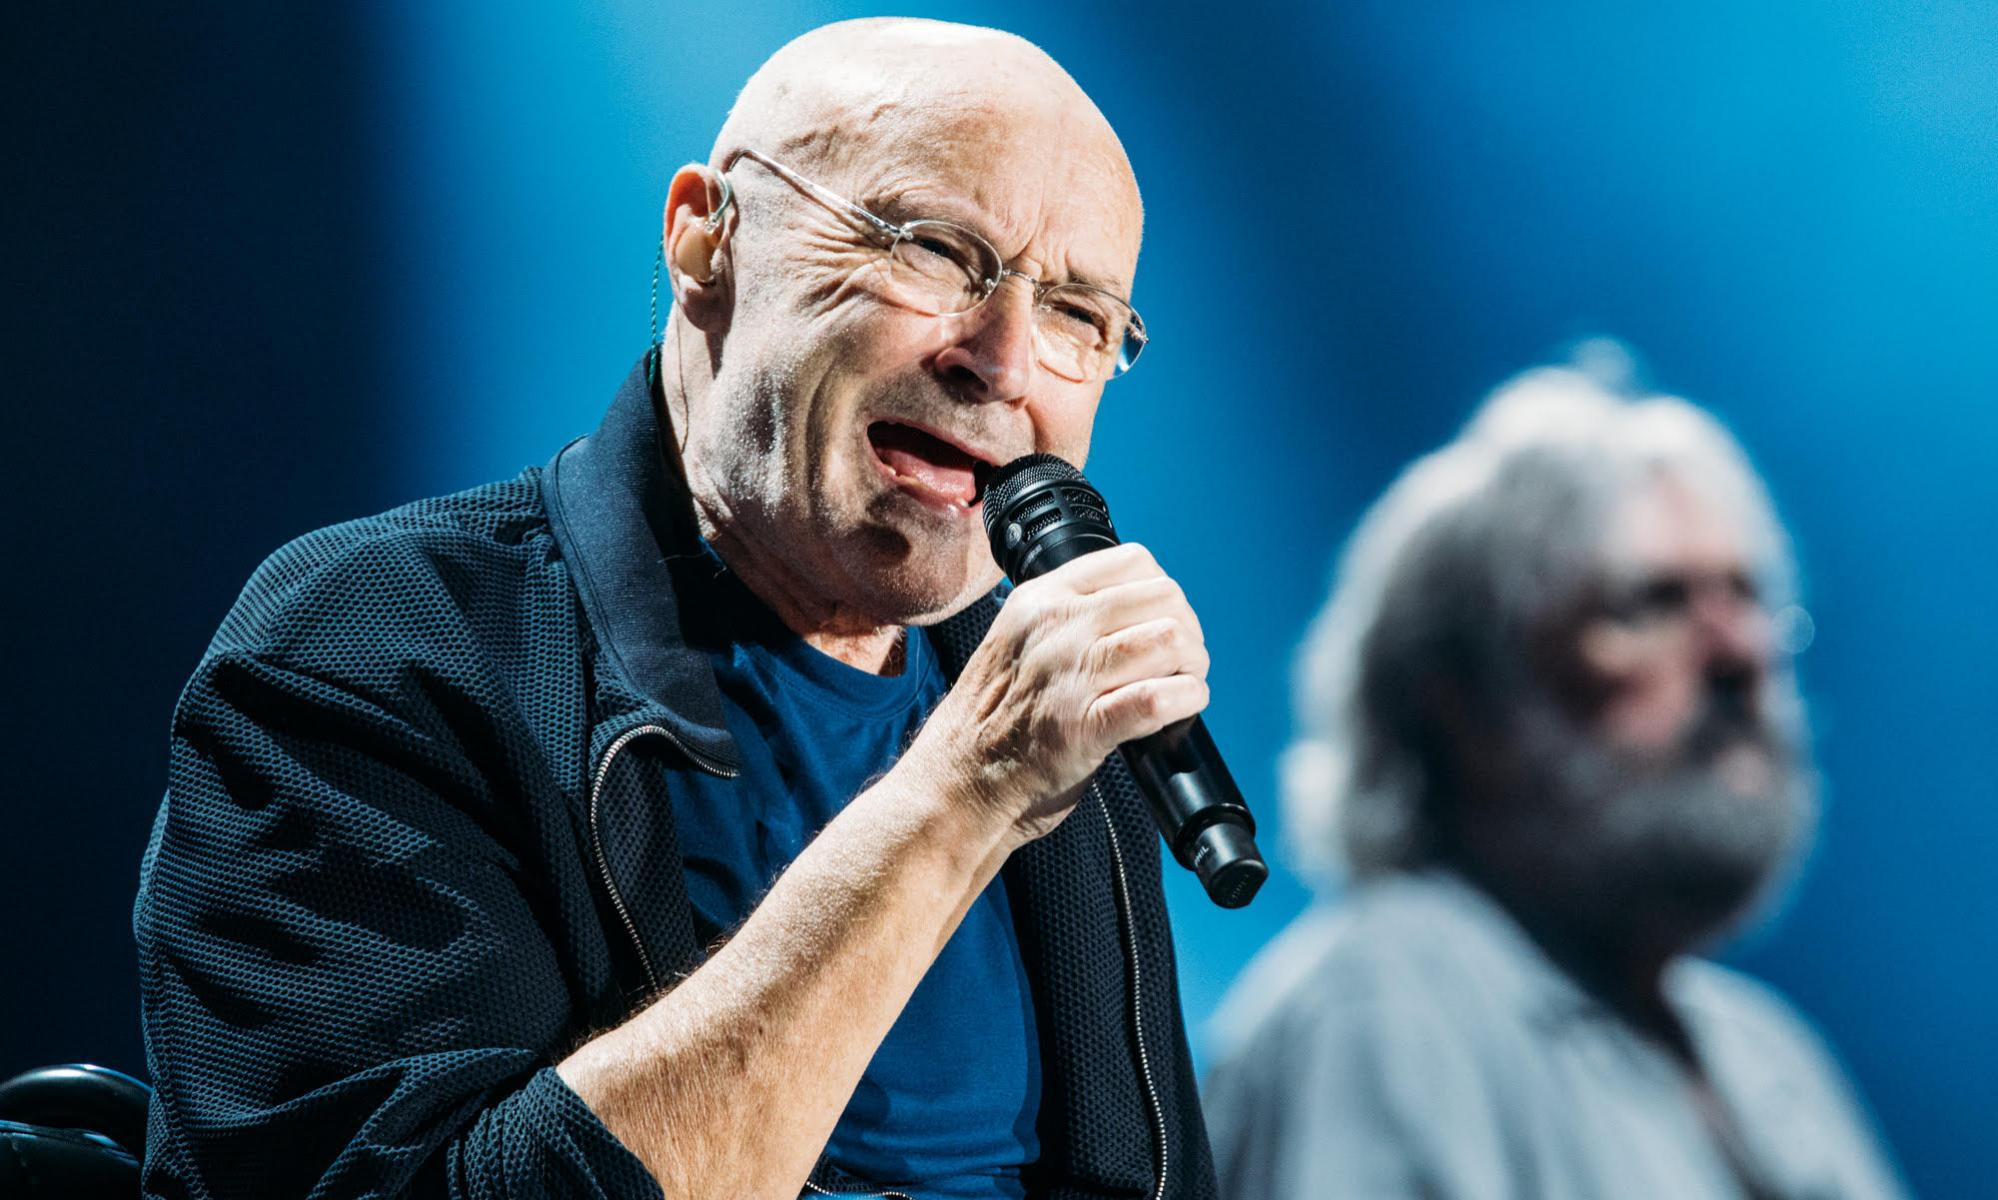 Phil Collins review – life-affirming MOR ballads delivered against all odds